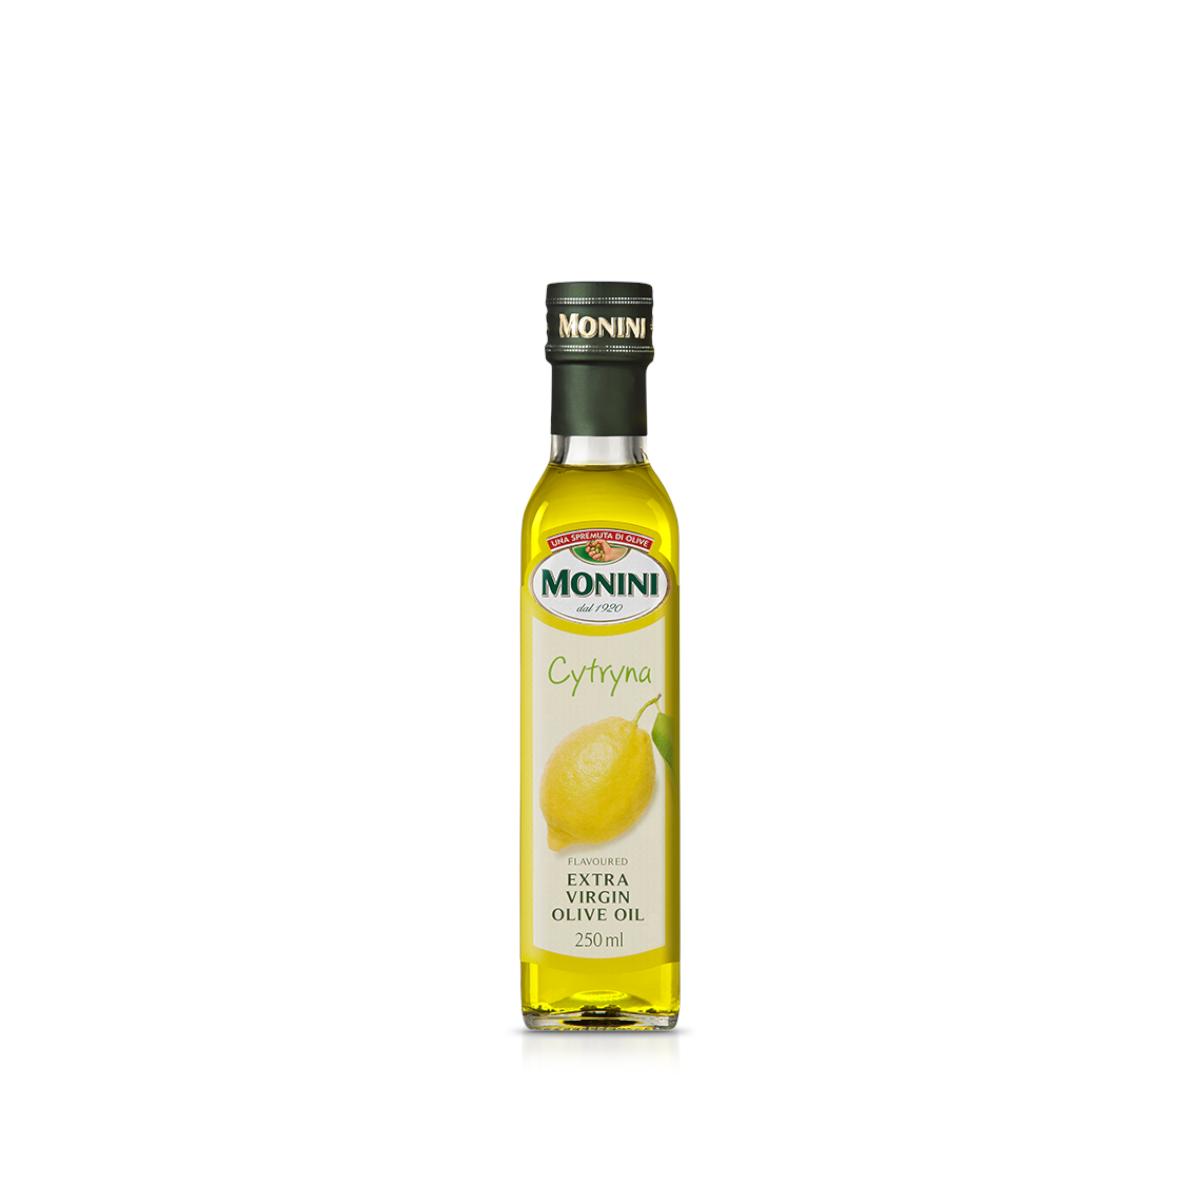 MO_Main_aromatizzato-LIMONE_POLONIA_474_990px